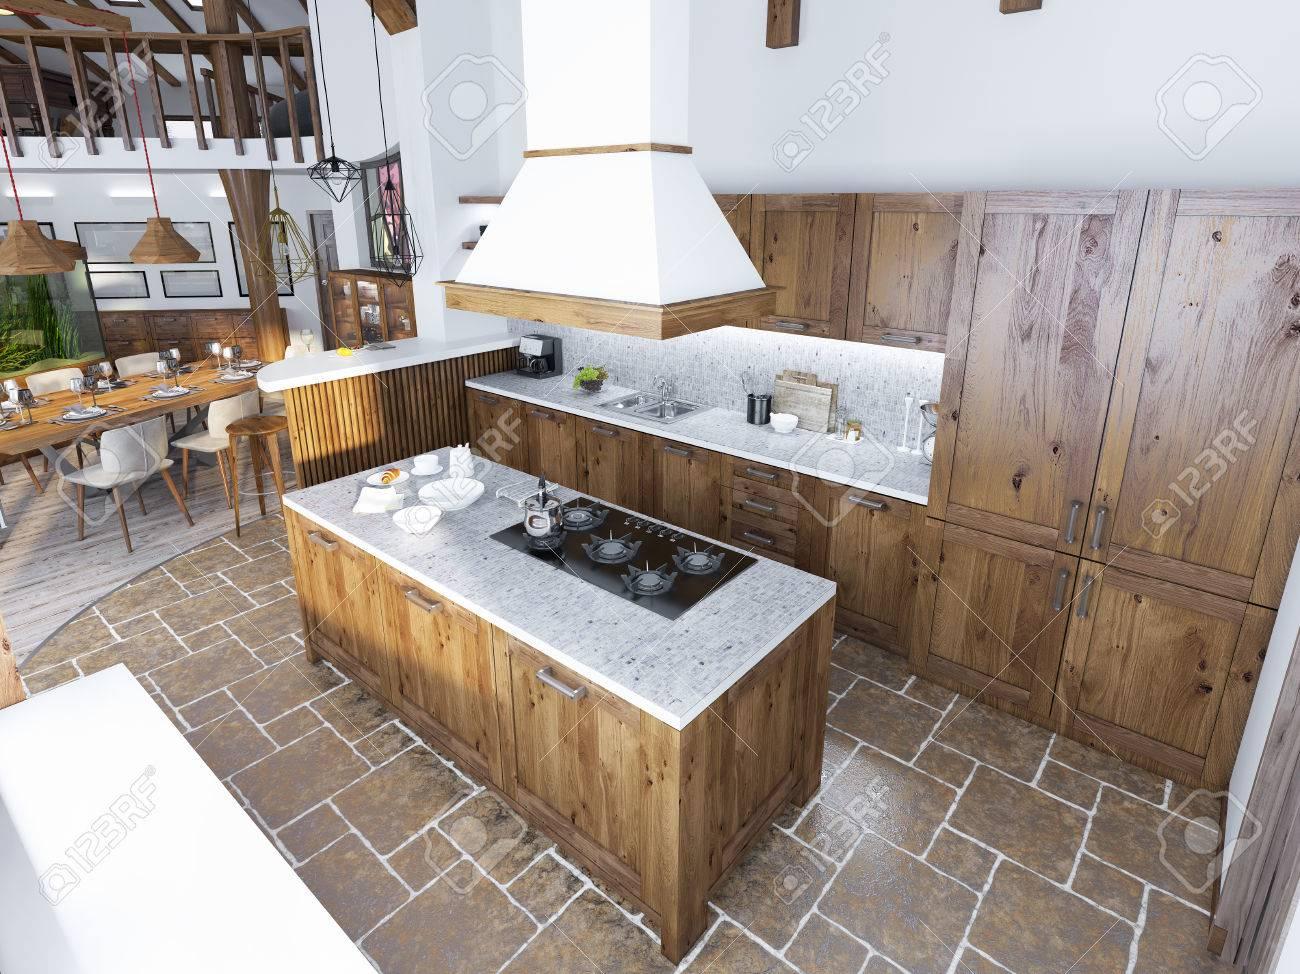 Awesome Progettare Una Cucina In 3d Contemporary - bakeroffroad.us ...